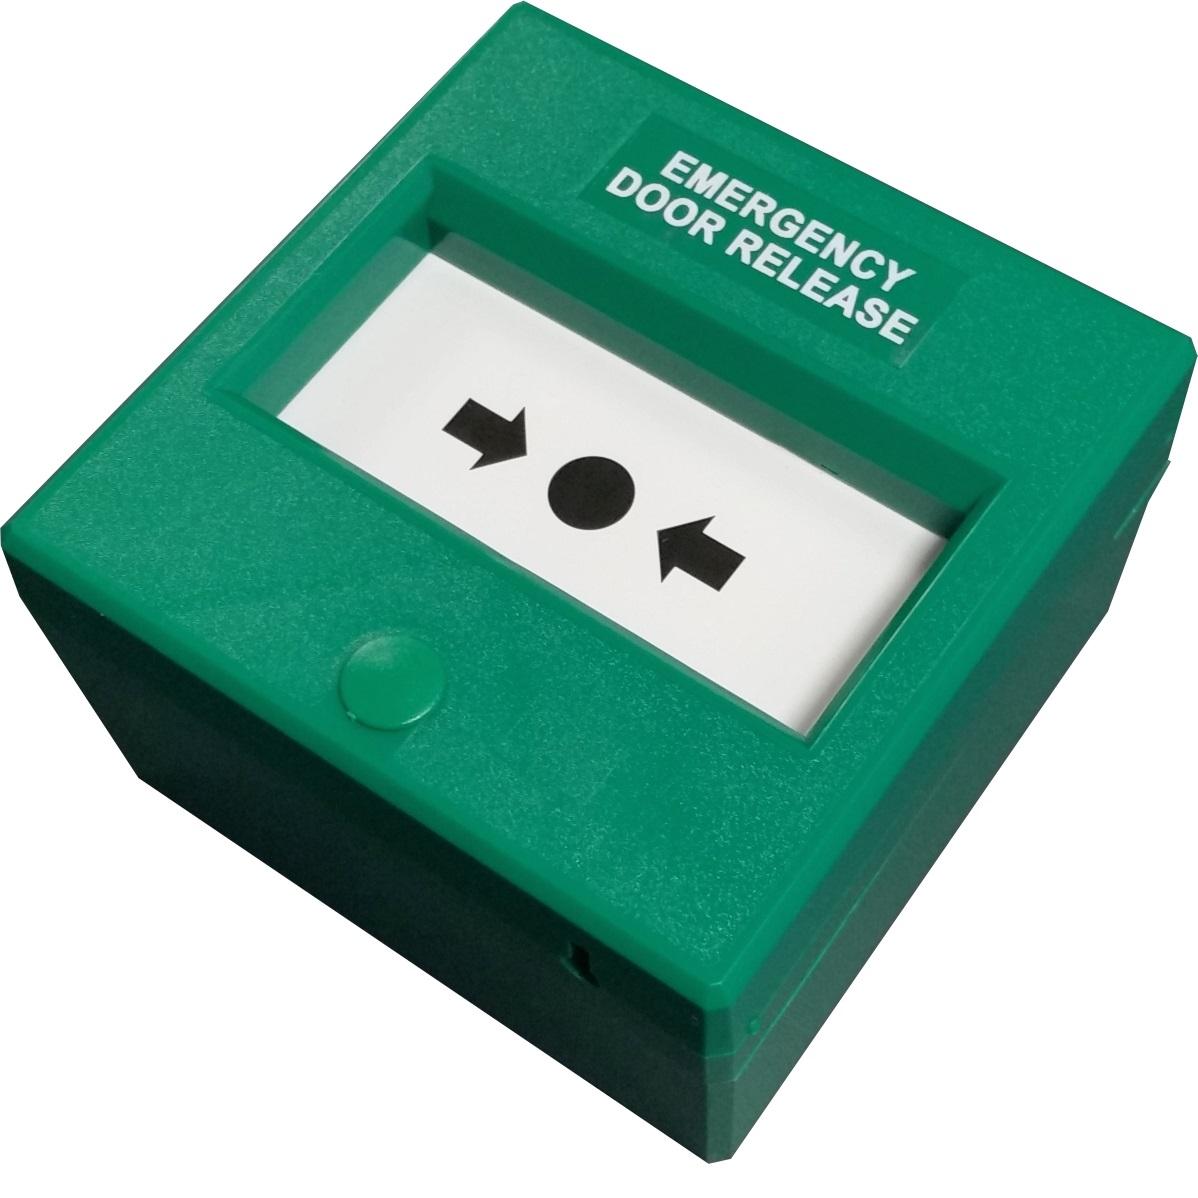 Green Quadruple Pole Call Point Emergency Door Release Like Glass Electronic